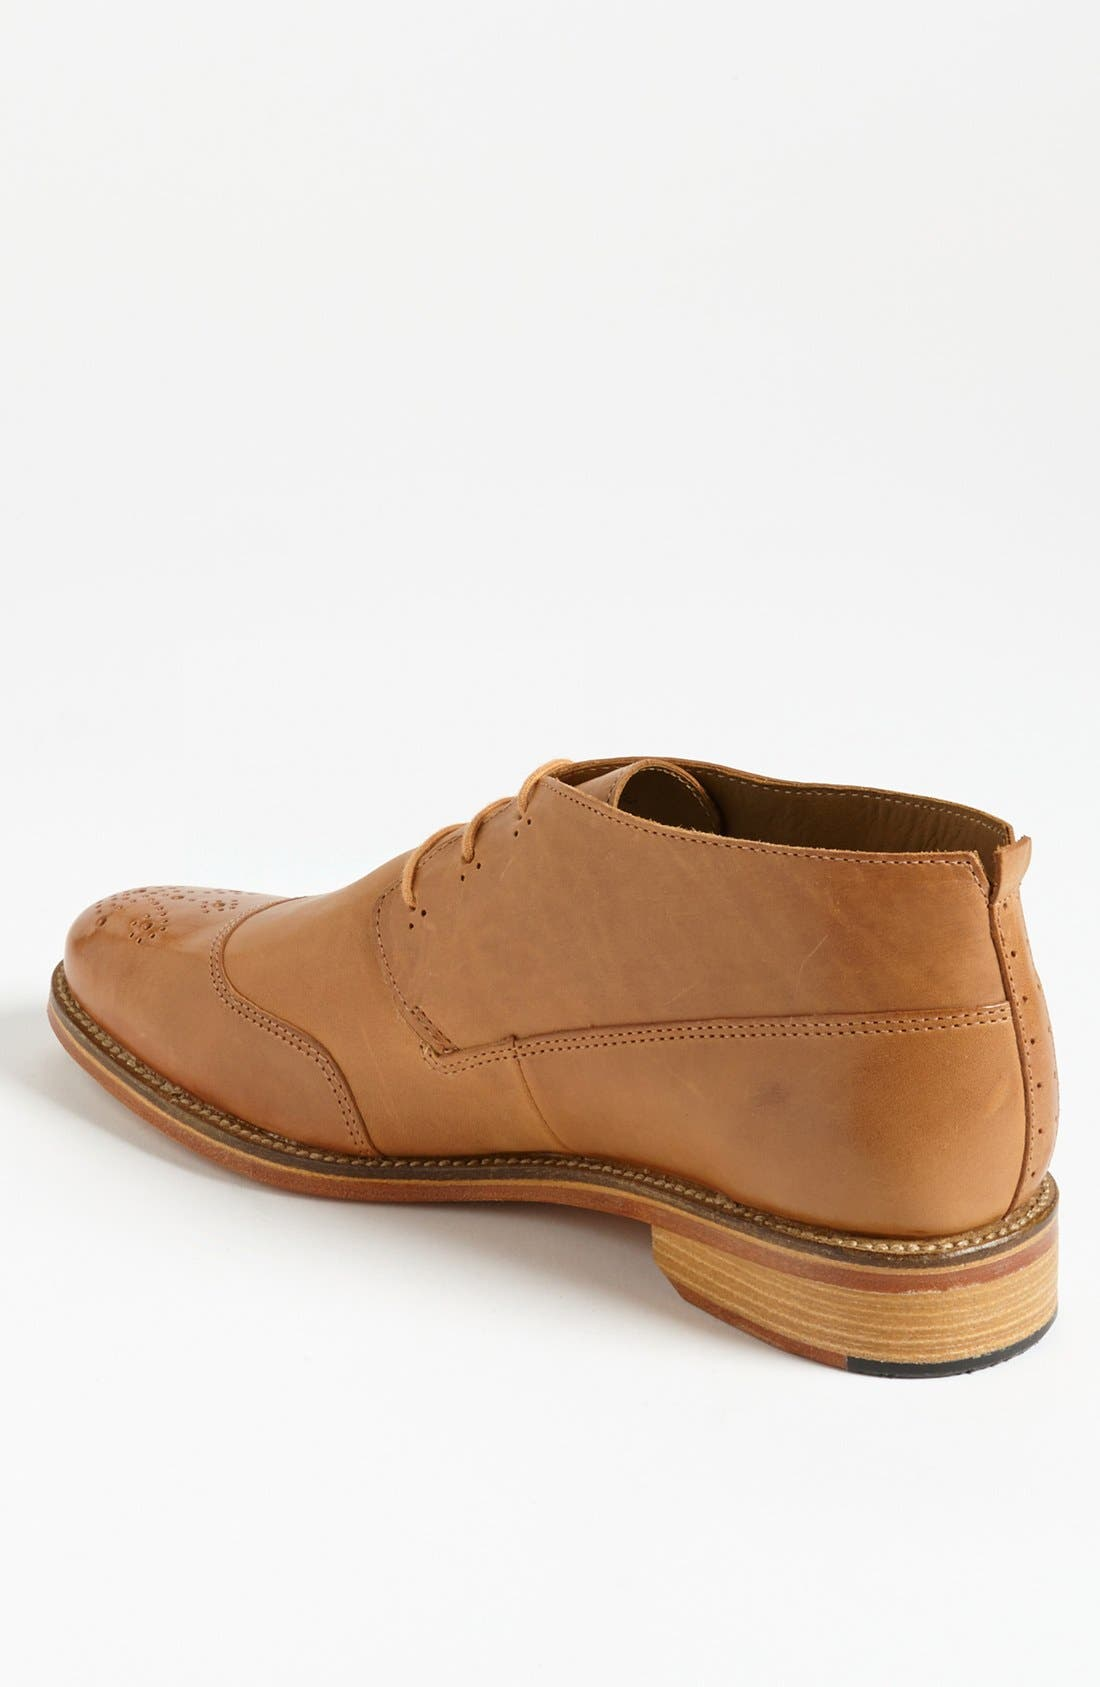 Alternate Image 2  - J SHOES 'Mason' Chukka Boot